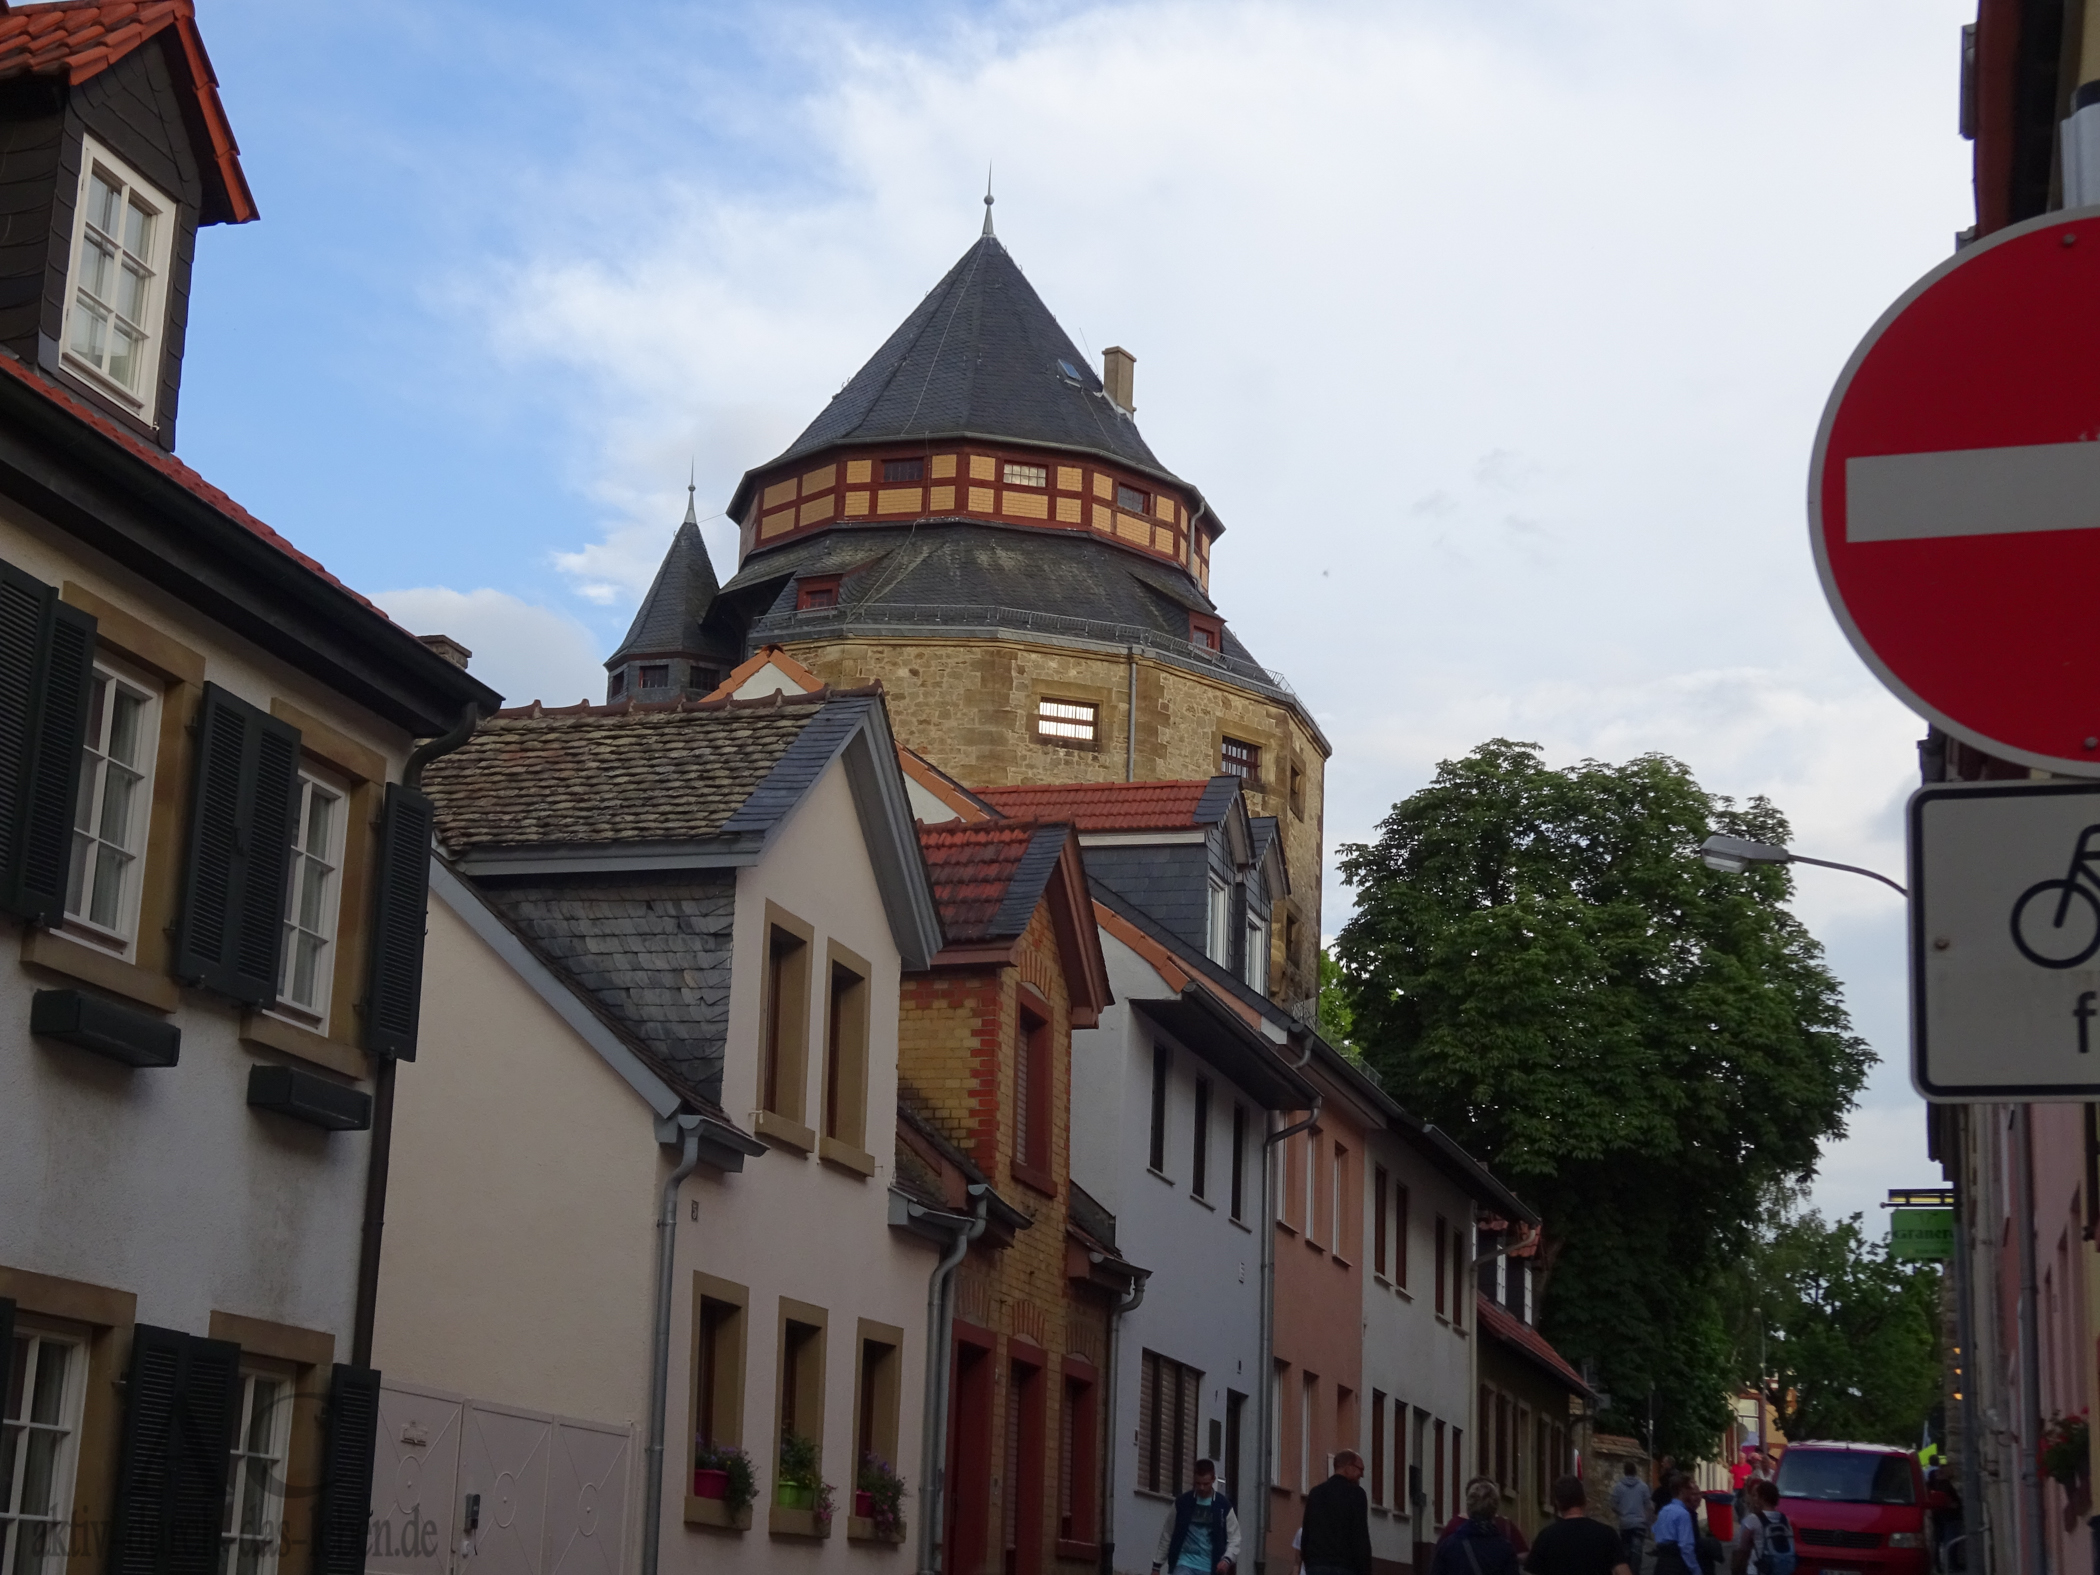 Teil des Alzeyer Schlosses